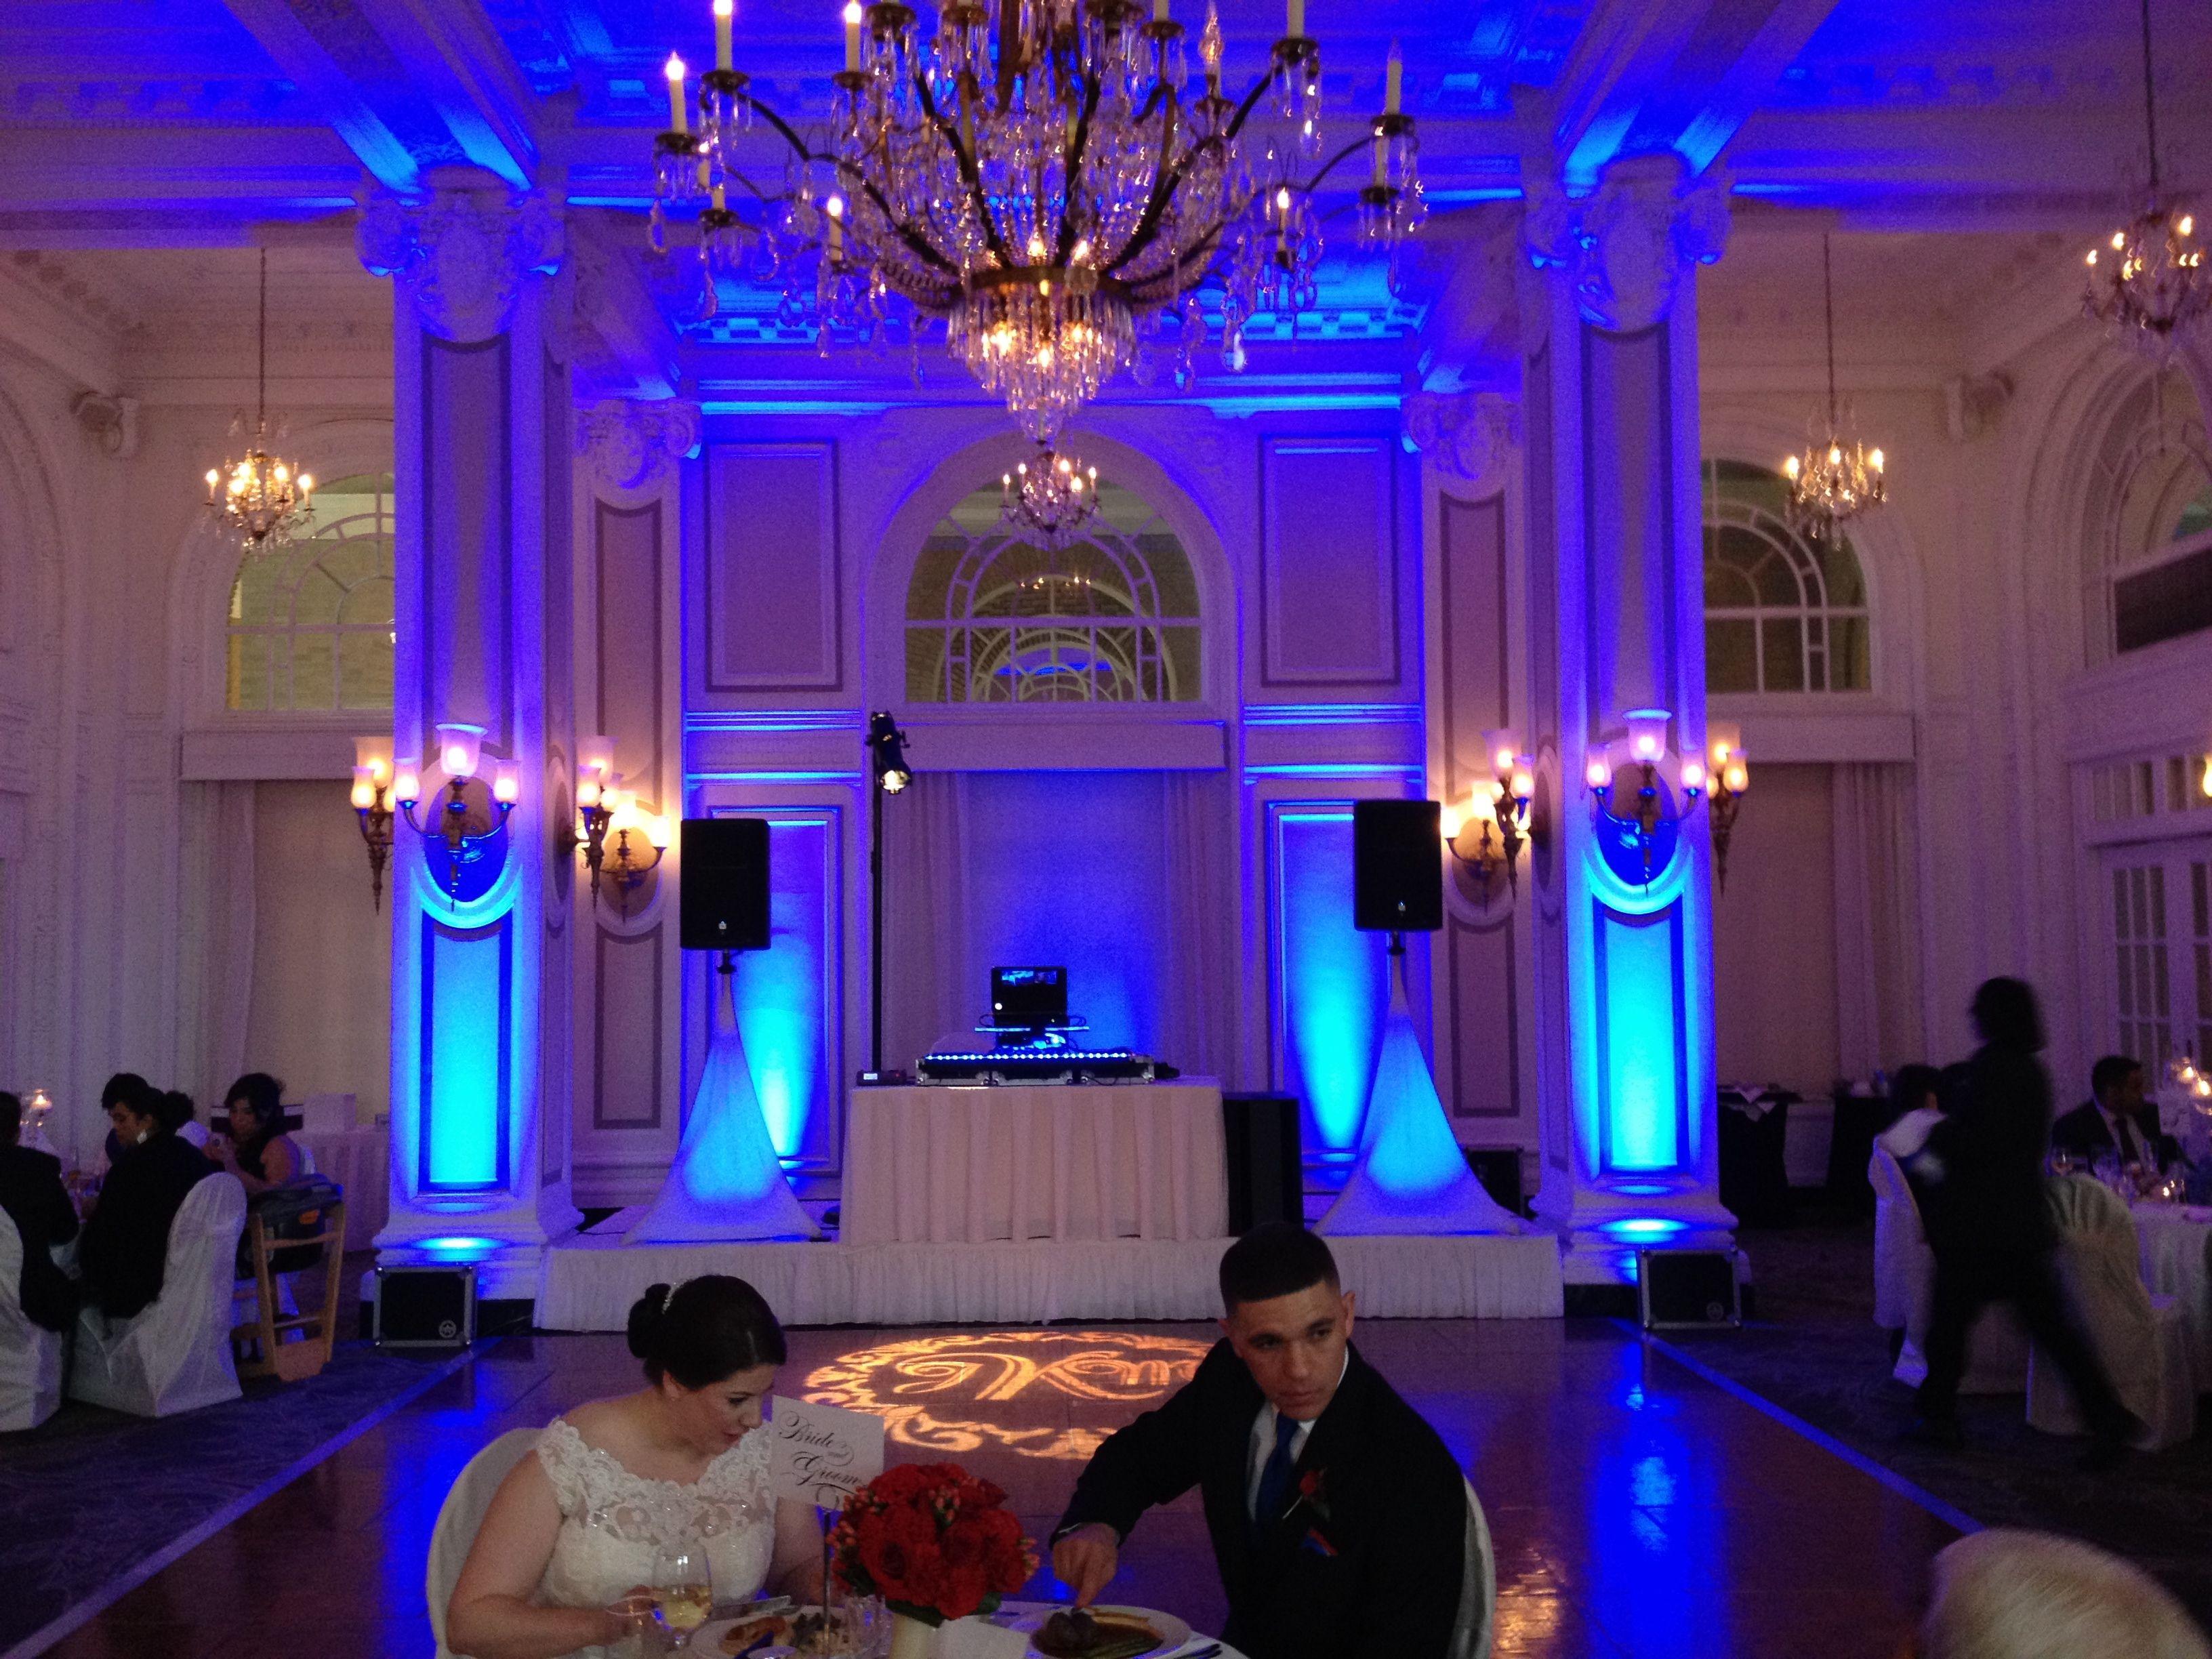 Fonix Entertainment Dj Lighting Setups Www Fonixentertainment Com Dj Equipment For Sale Event Lighting Dj Equipment